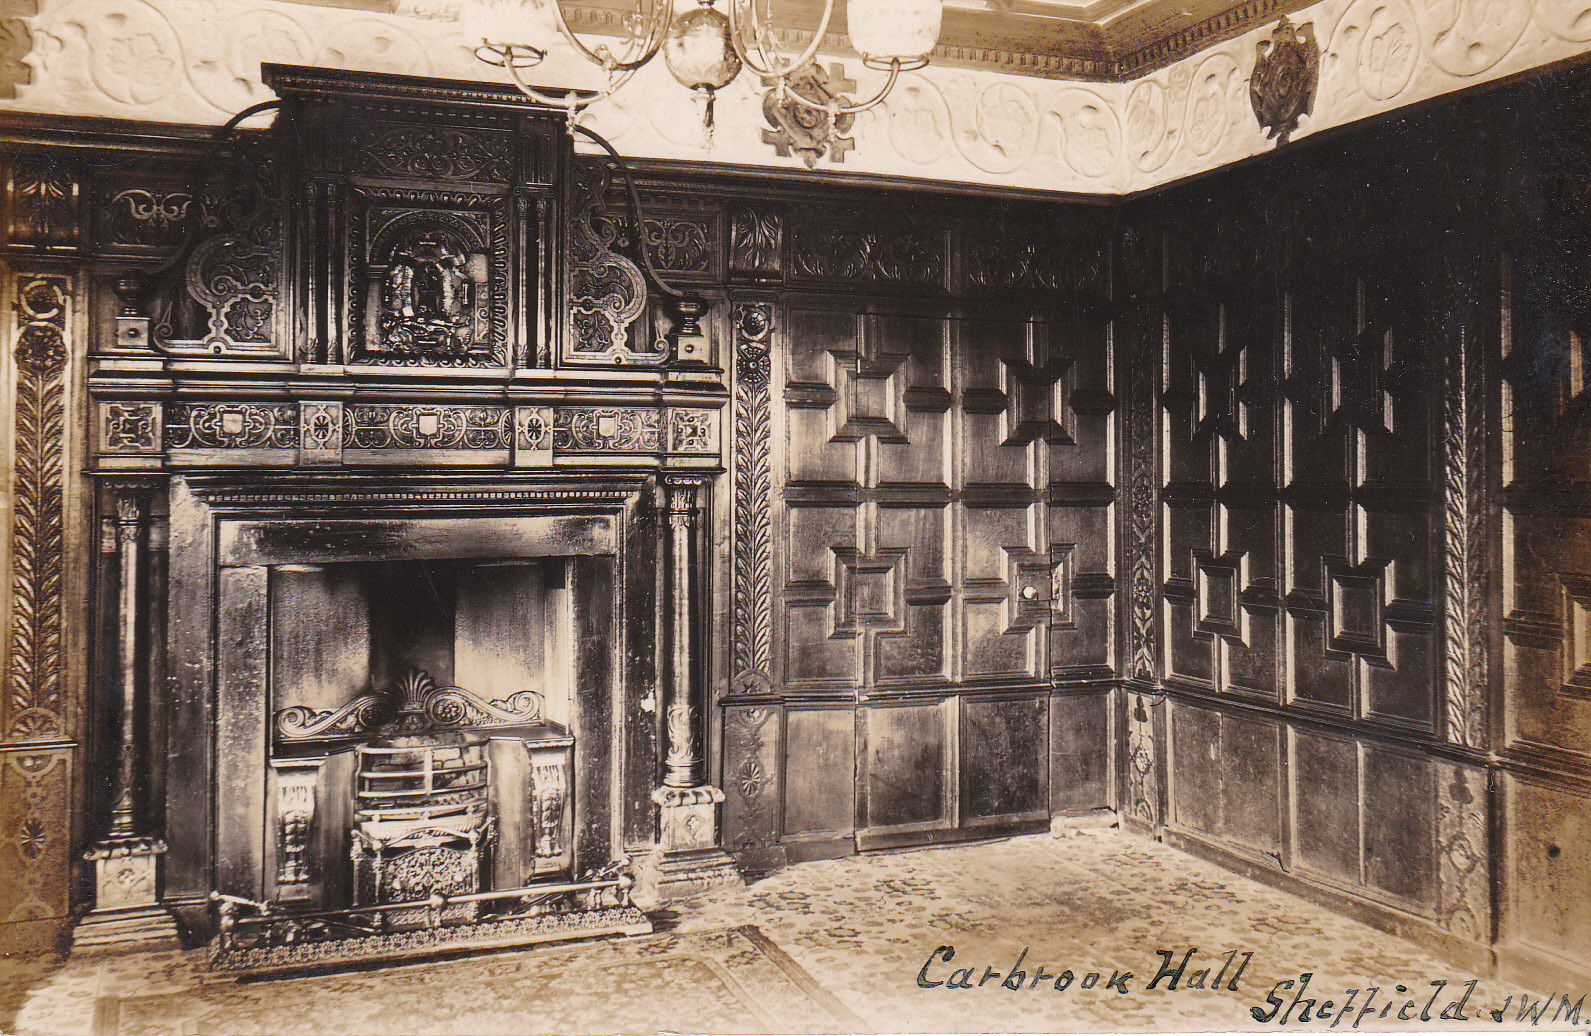 Carbrook Hall Sheffield.jpg